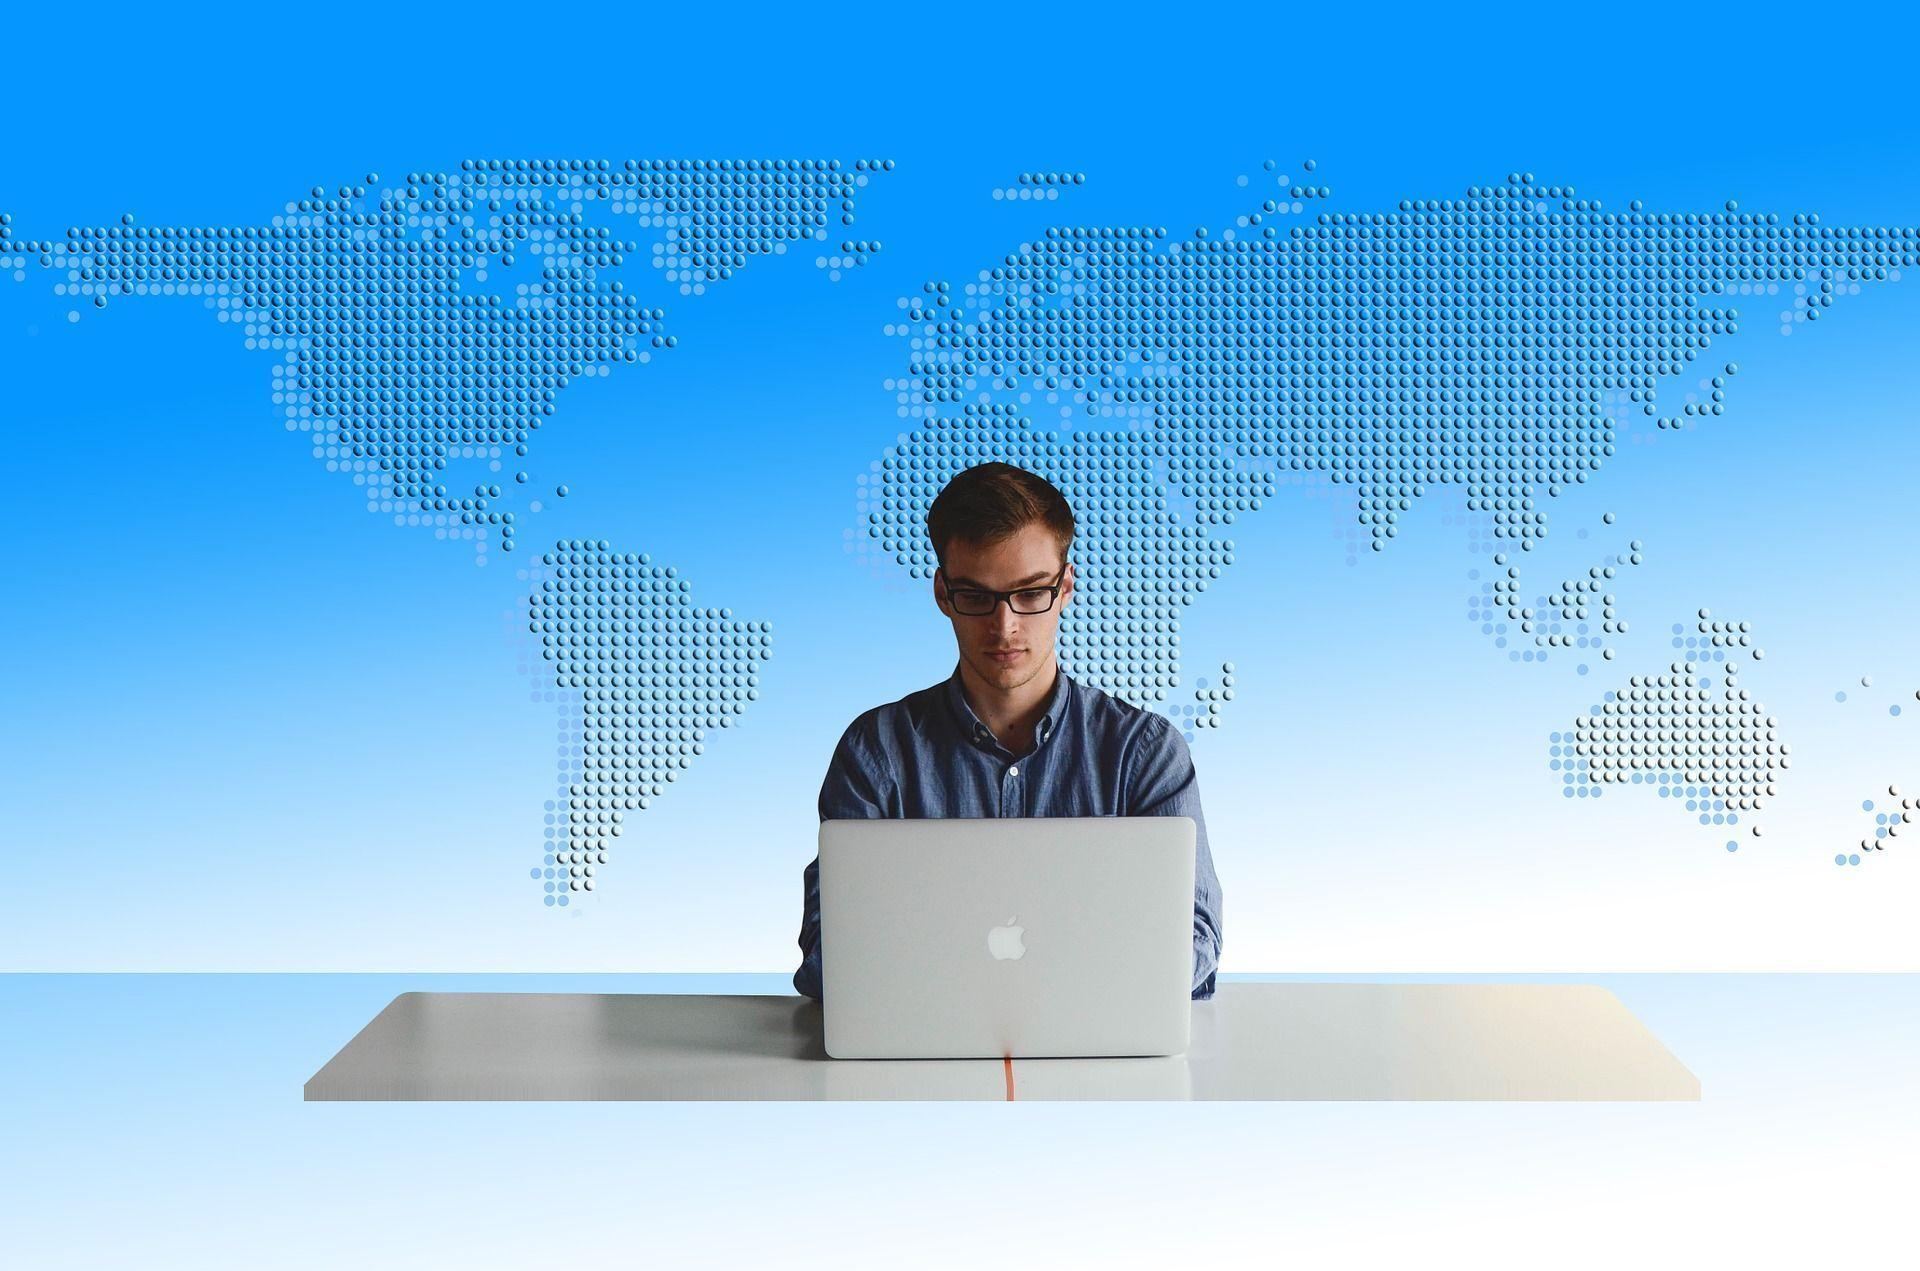 Aprende a ganar dinero online